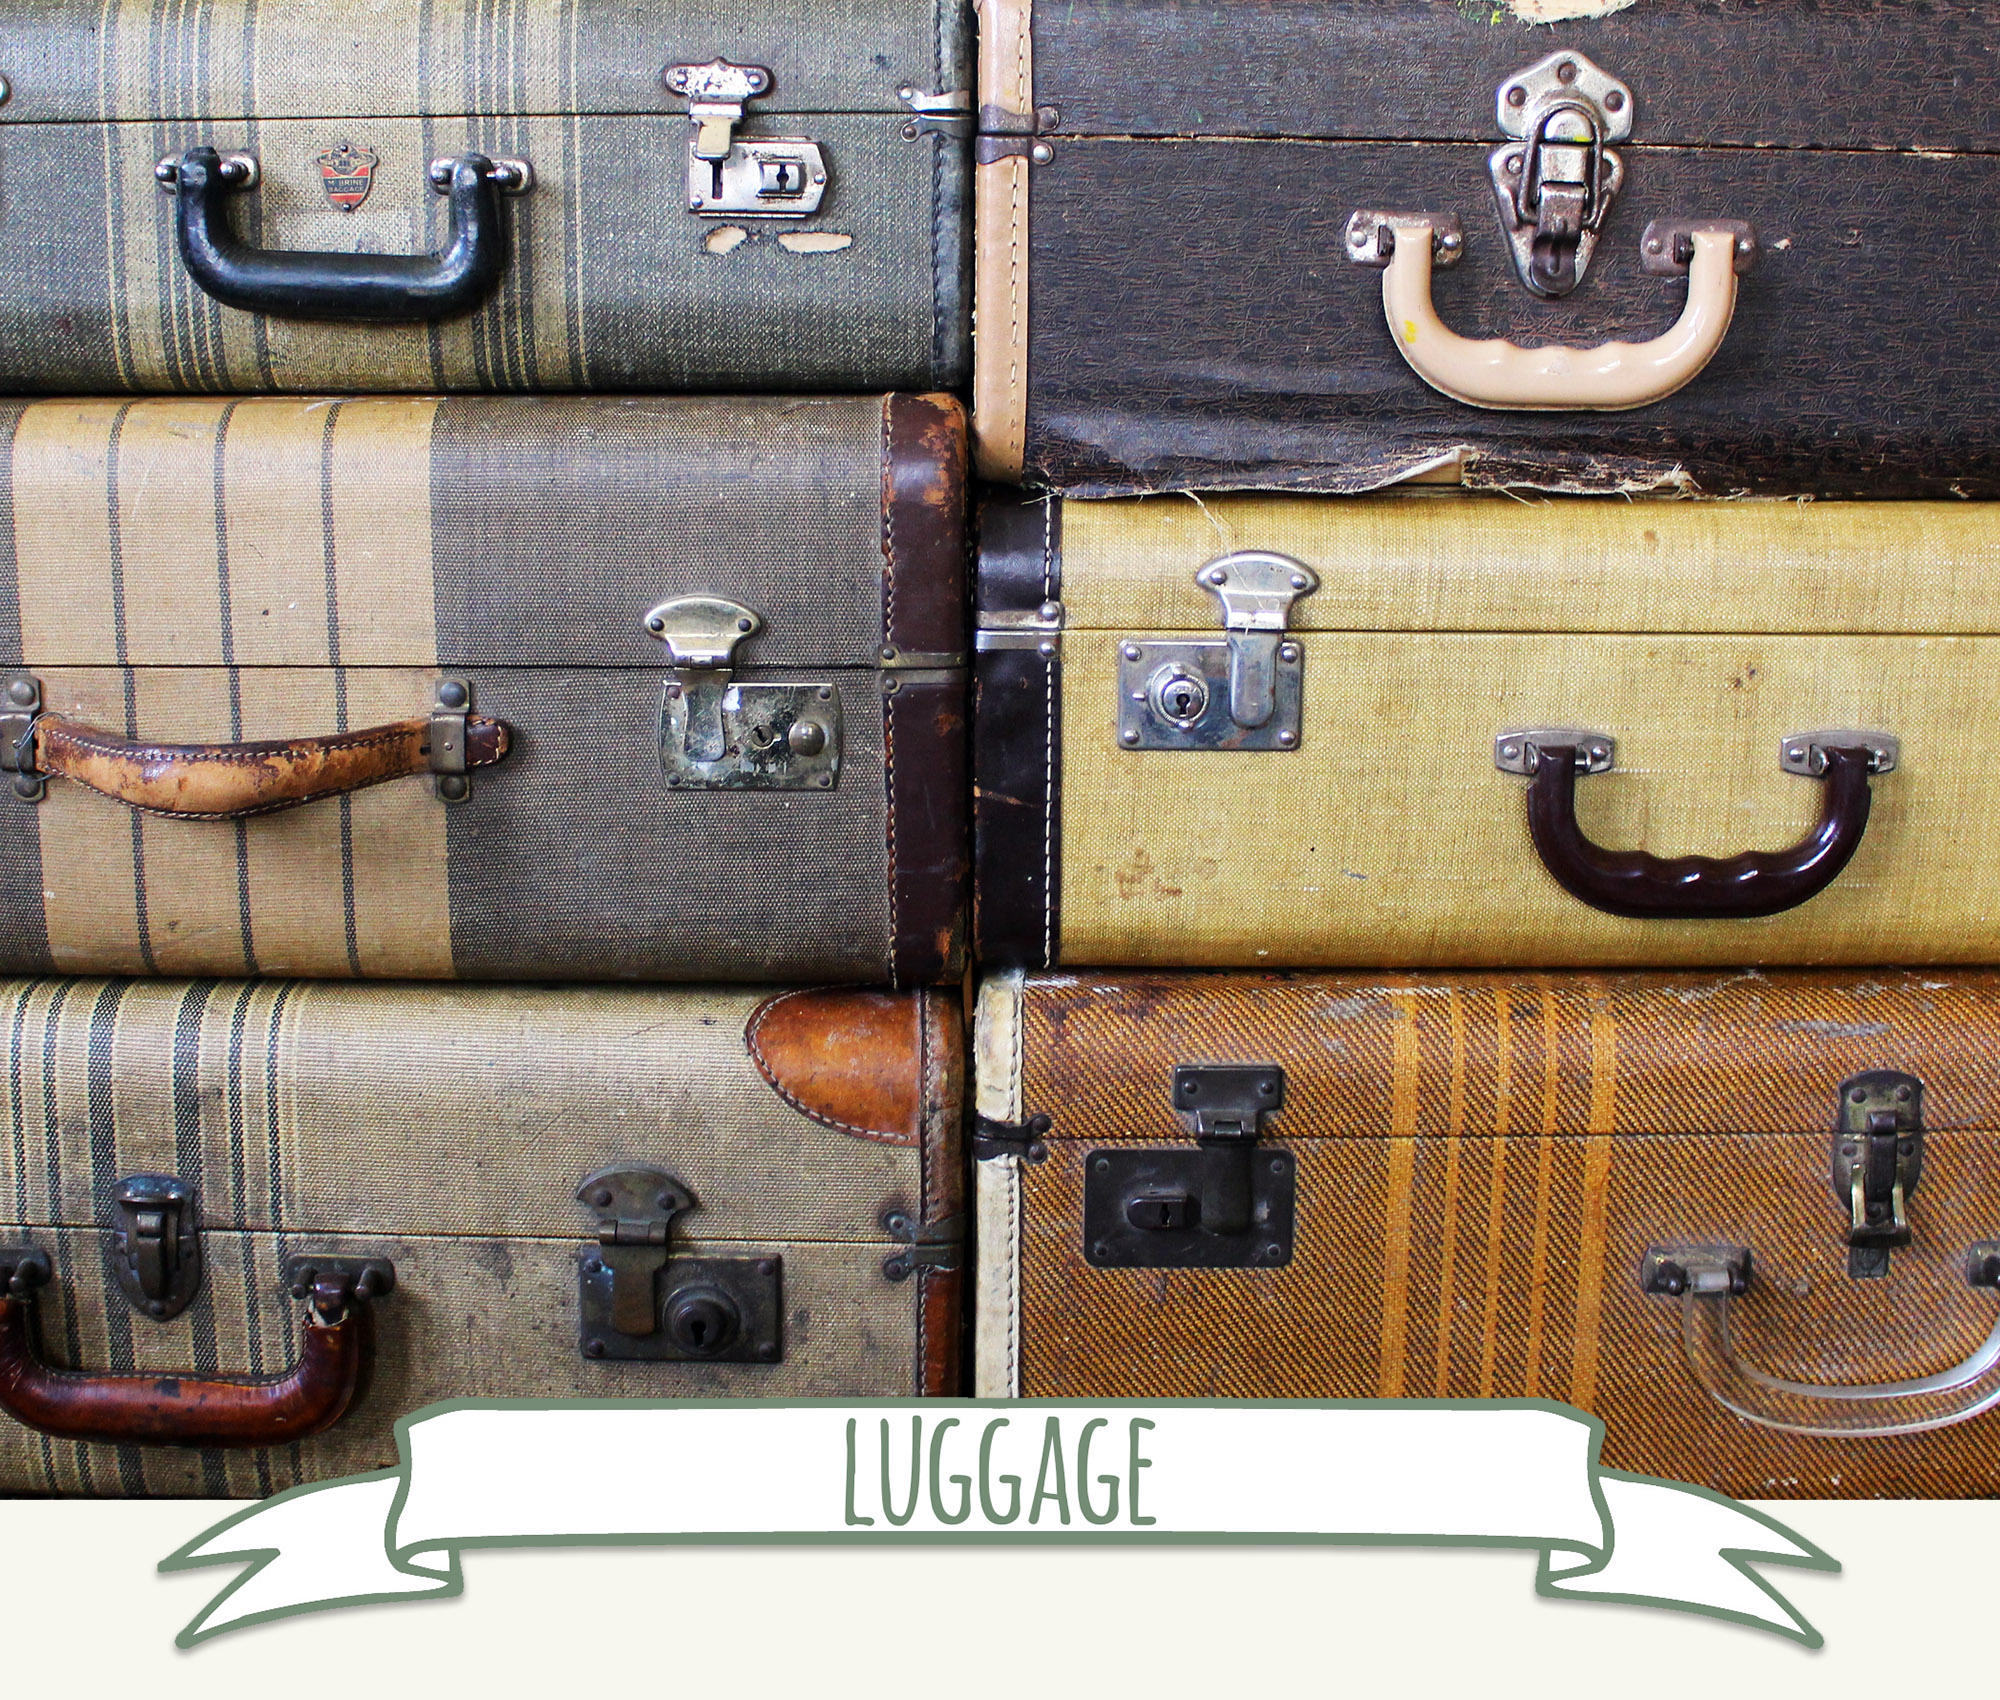 Luggage Button.jpg